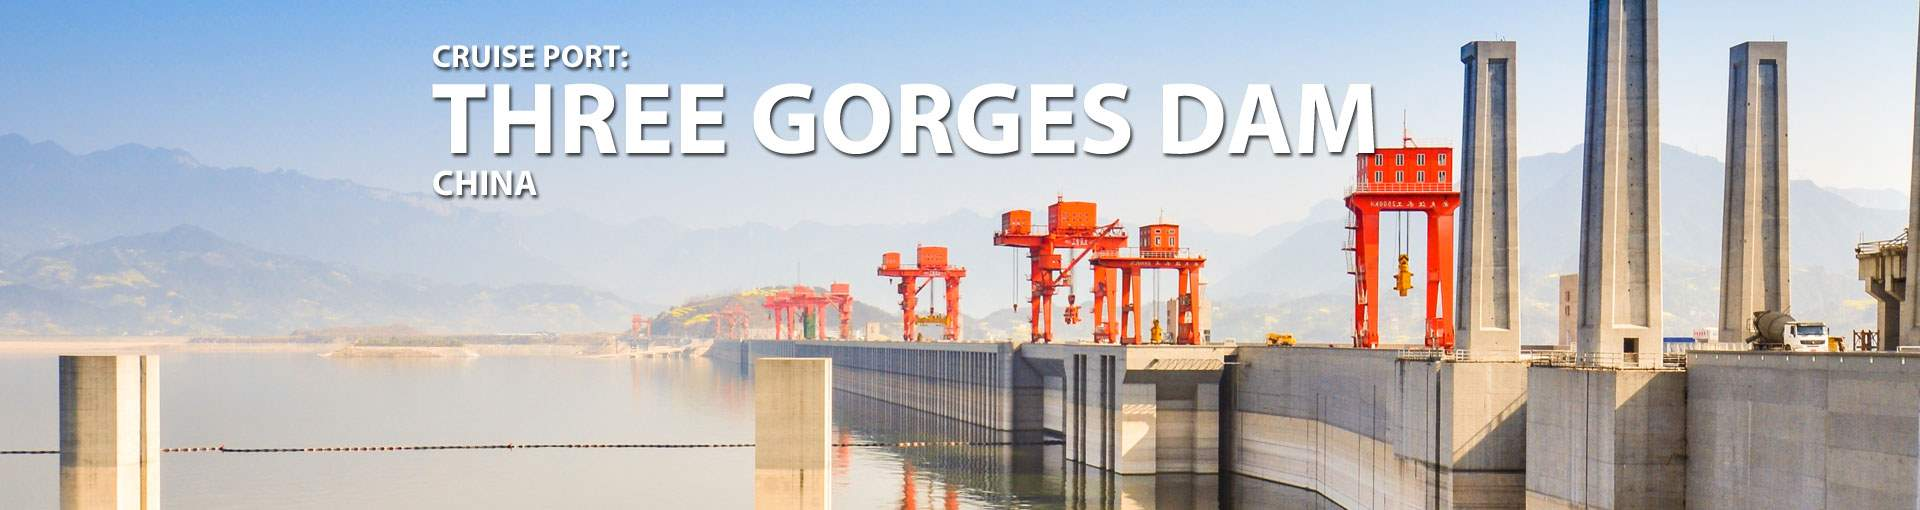 Cruises to Three Gorges Dam